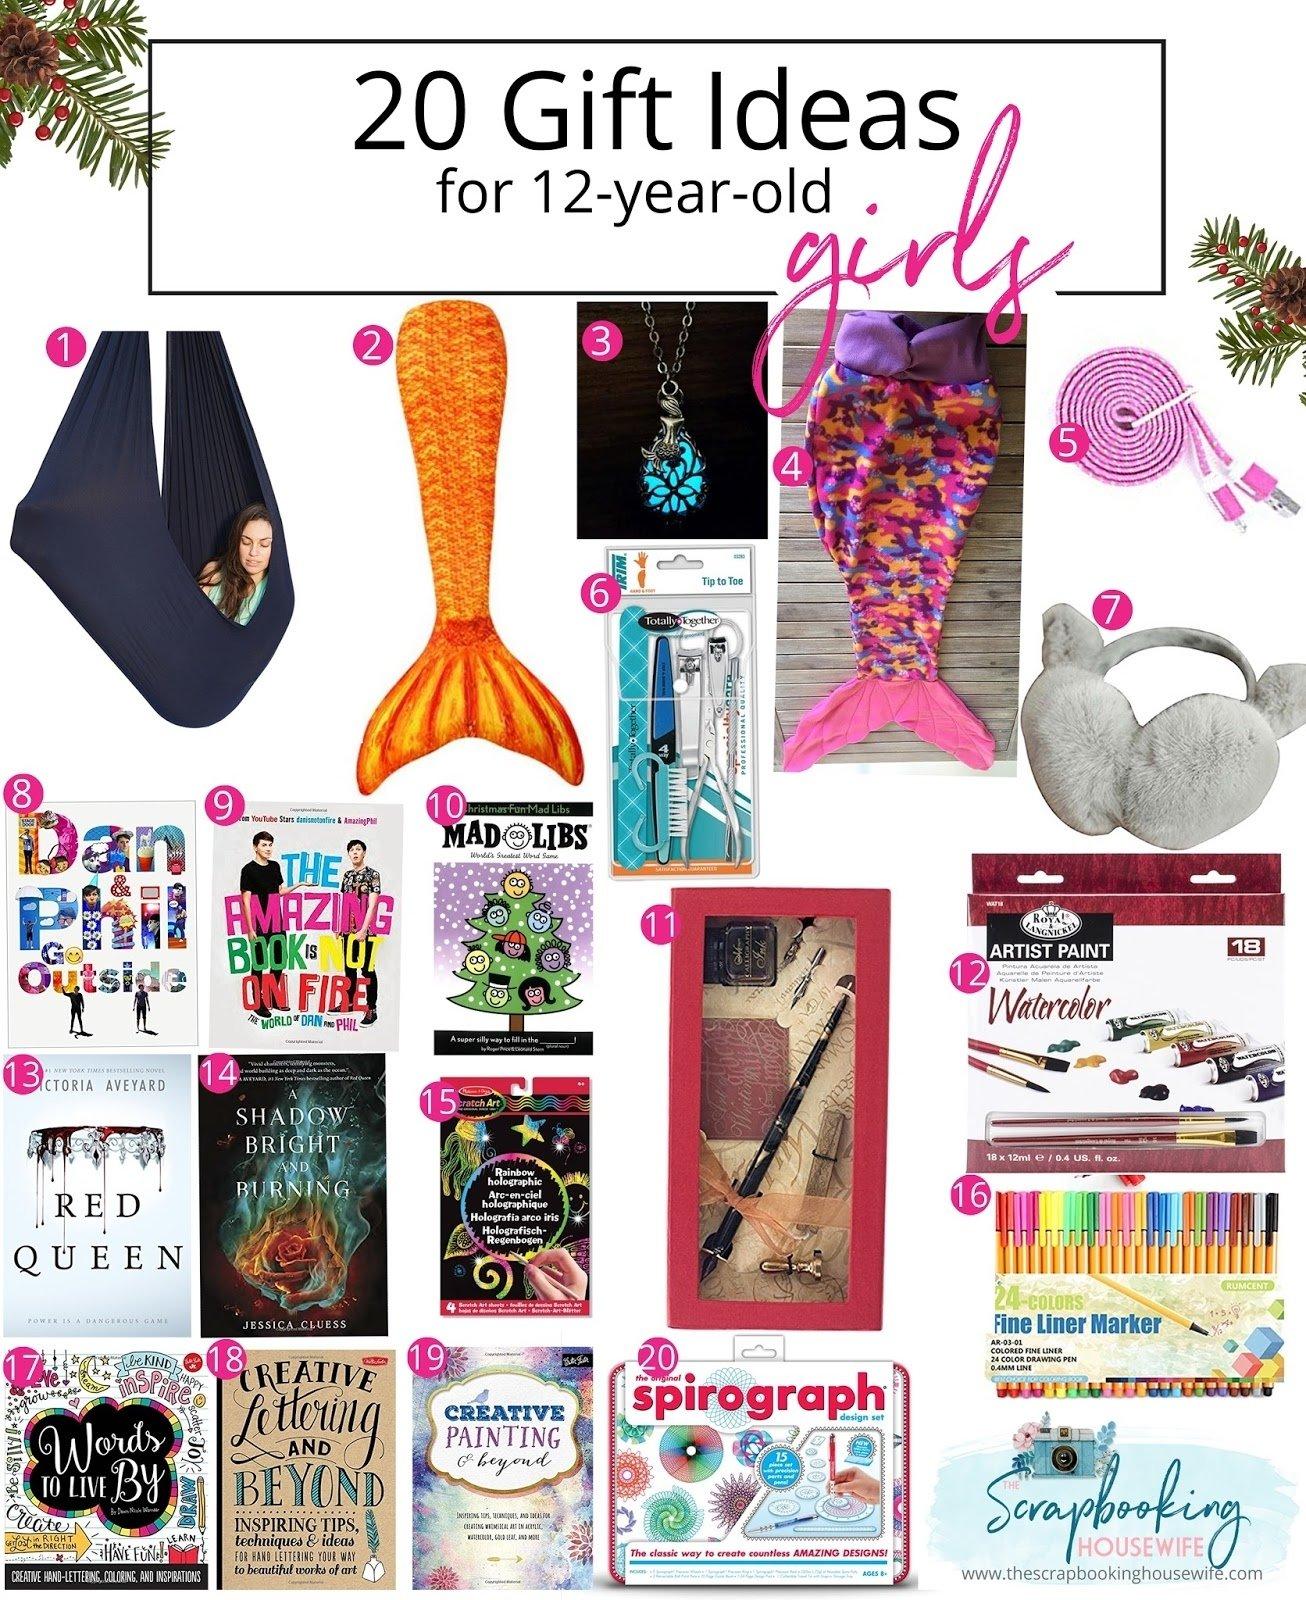 10 Cute Christmas Gift Ideas For 12 Yr Old Girl smart ideas christmas gifts for 18 year old girl twenty olds 1 2020